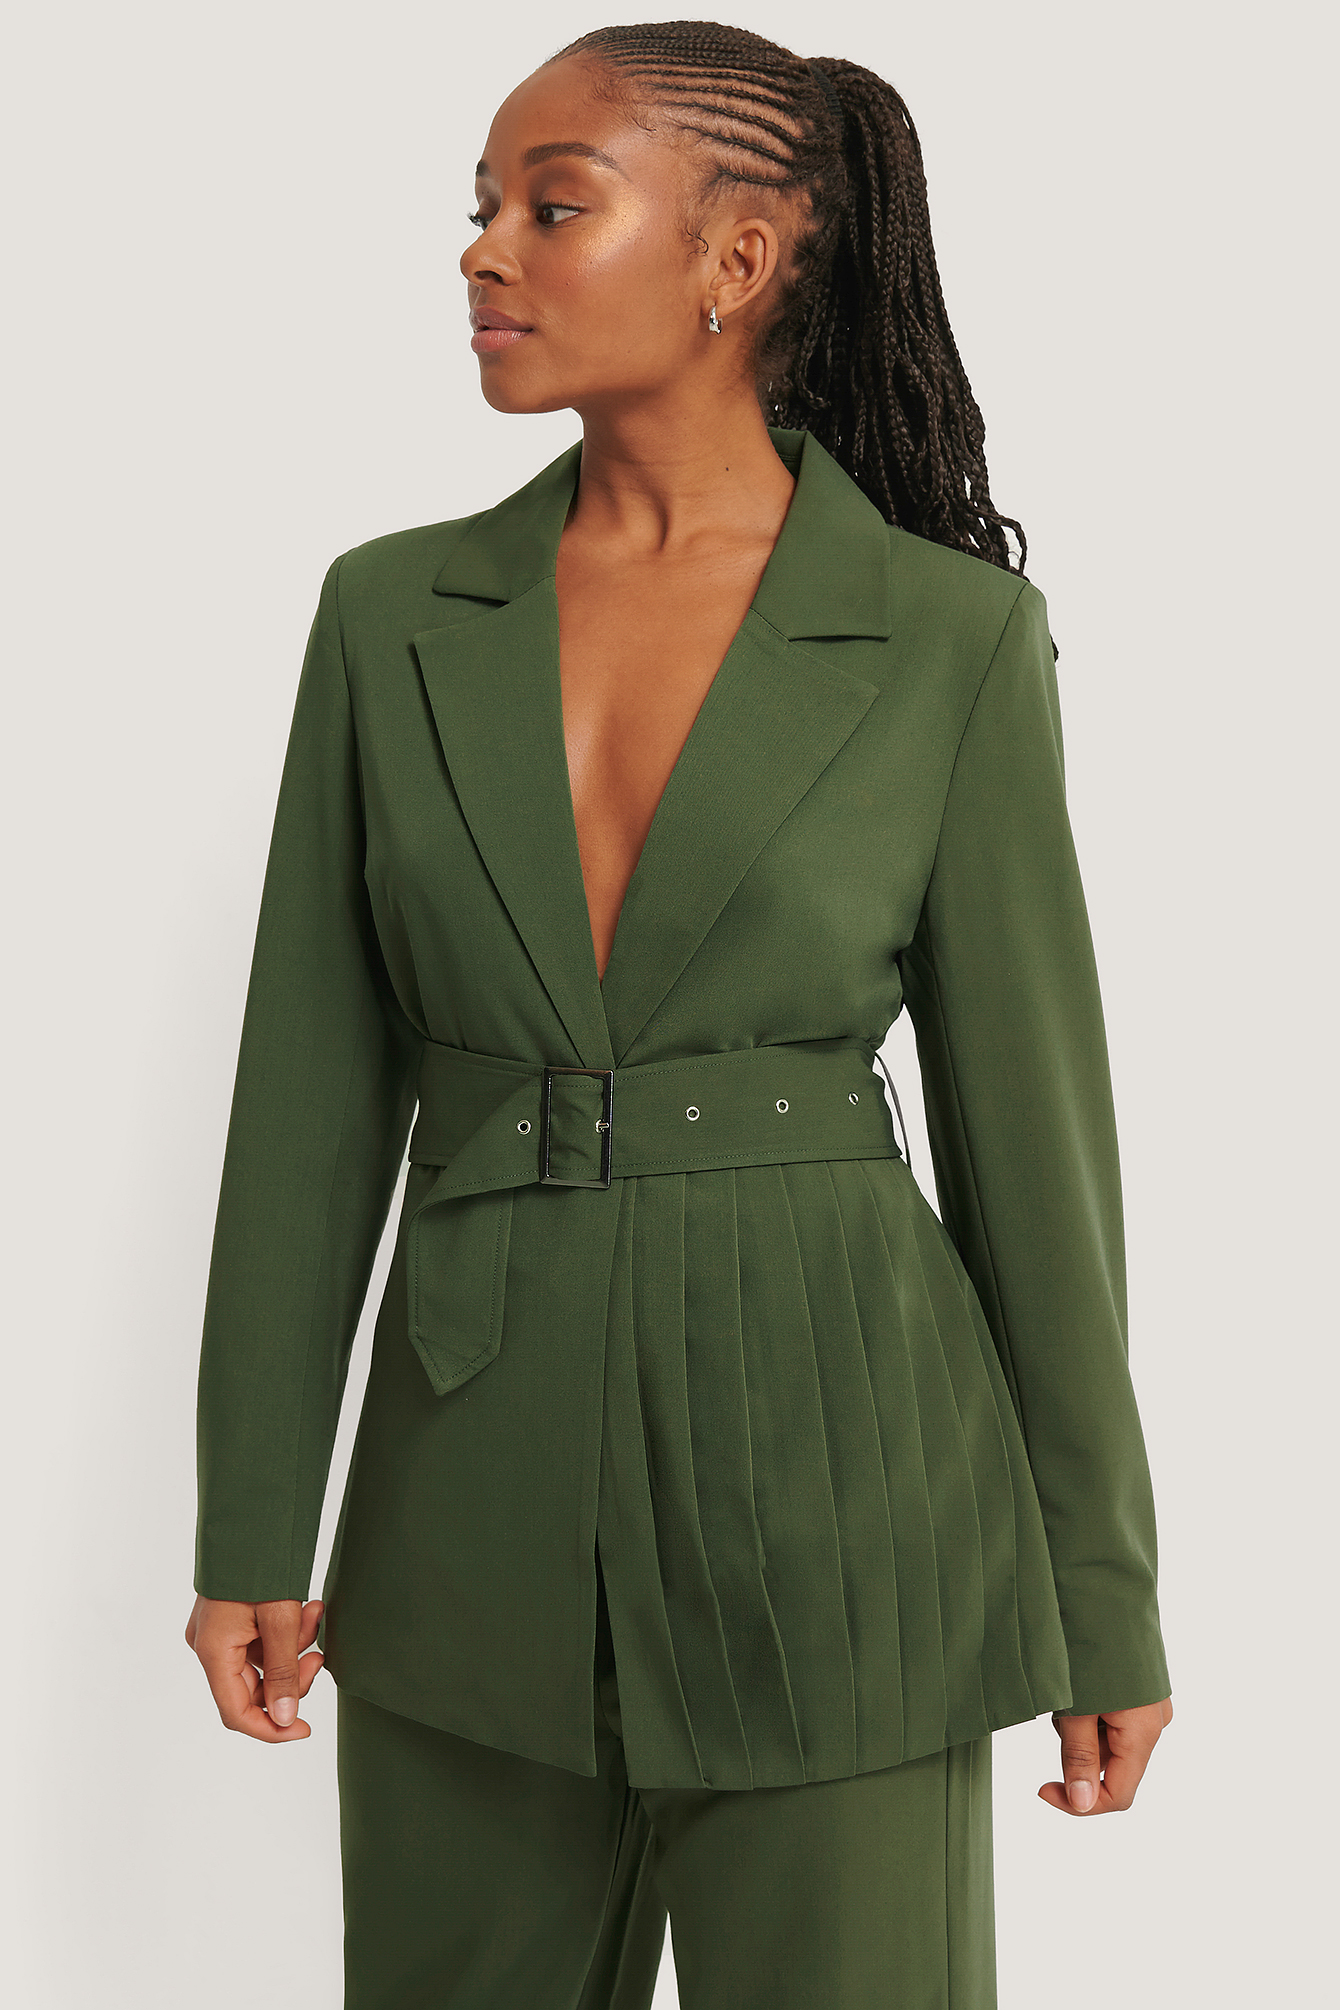 Romy X Na-kd Pleat Detail Belted Blazer Green In Dark Green